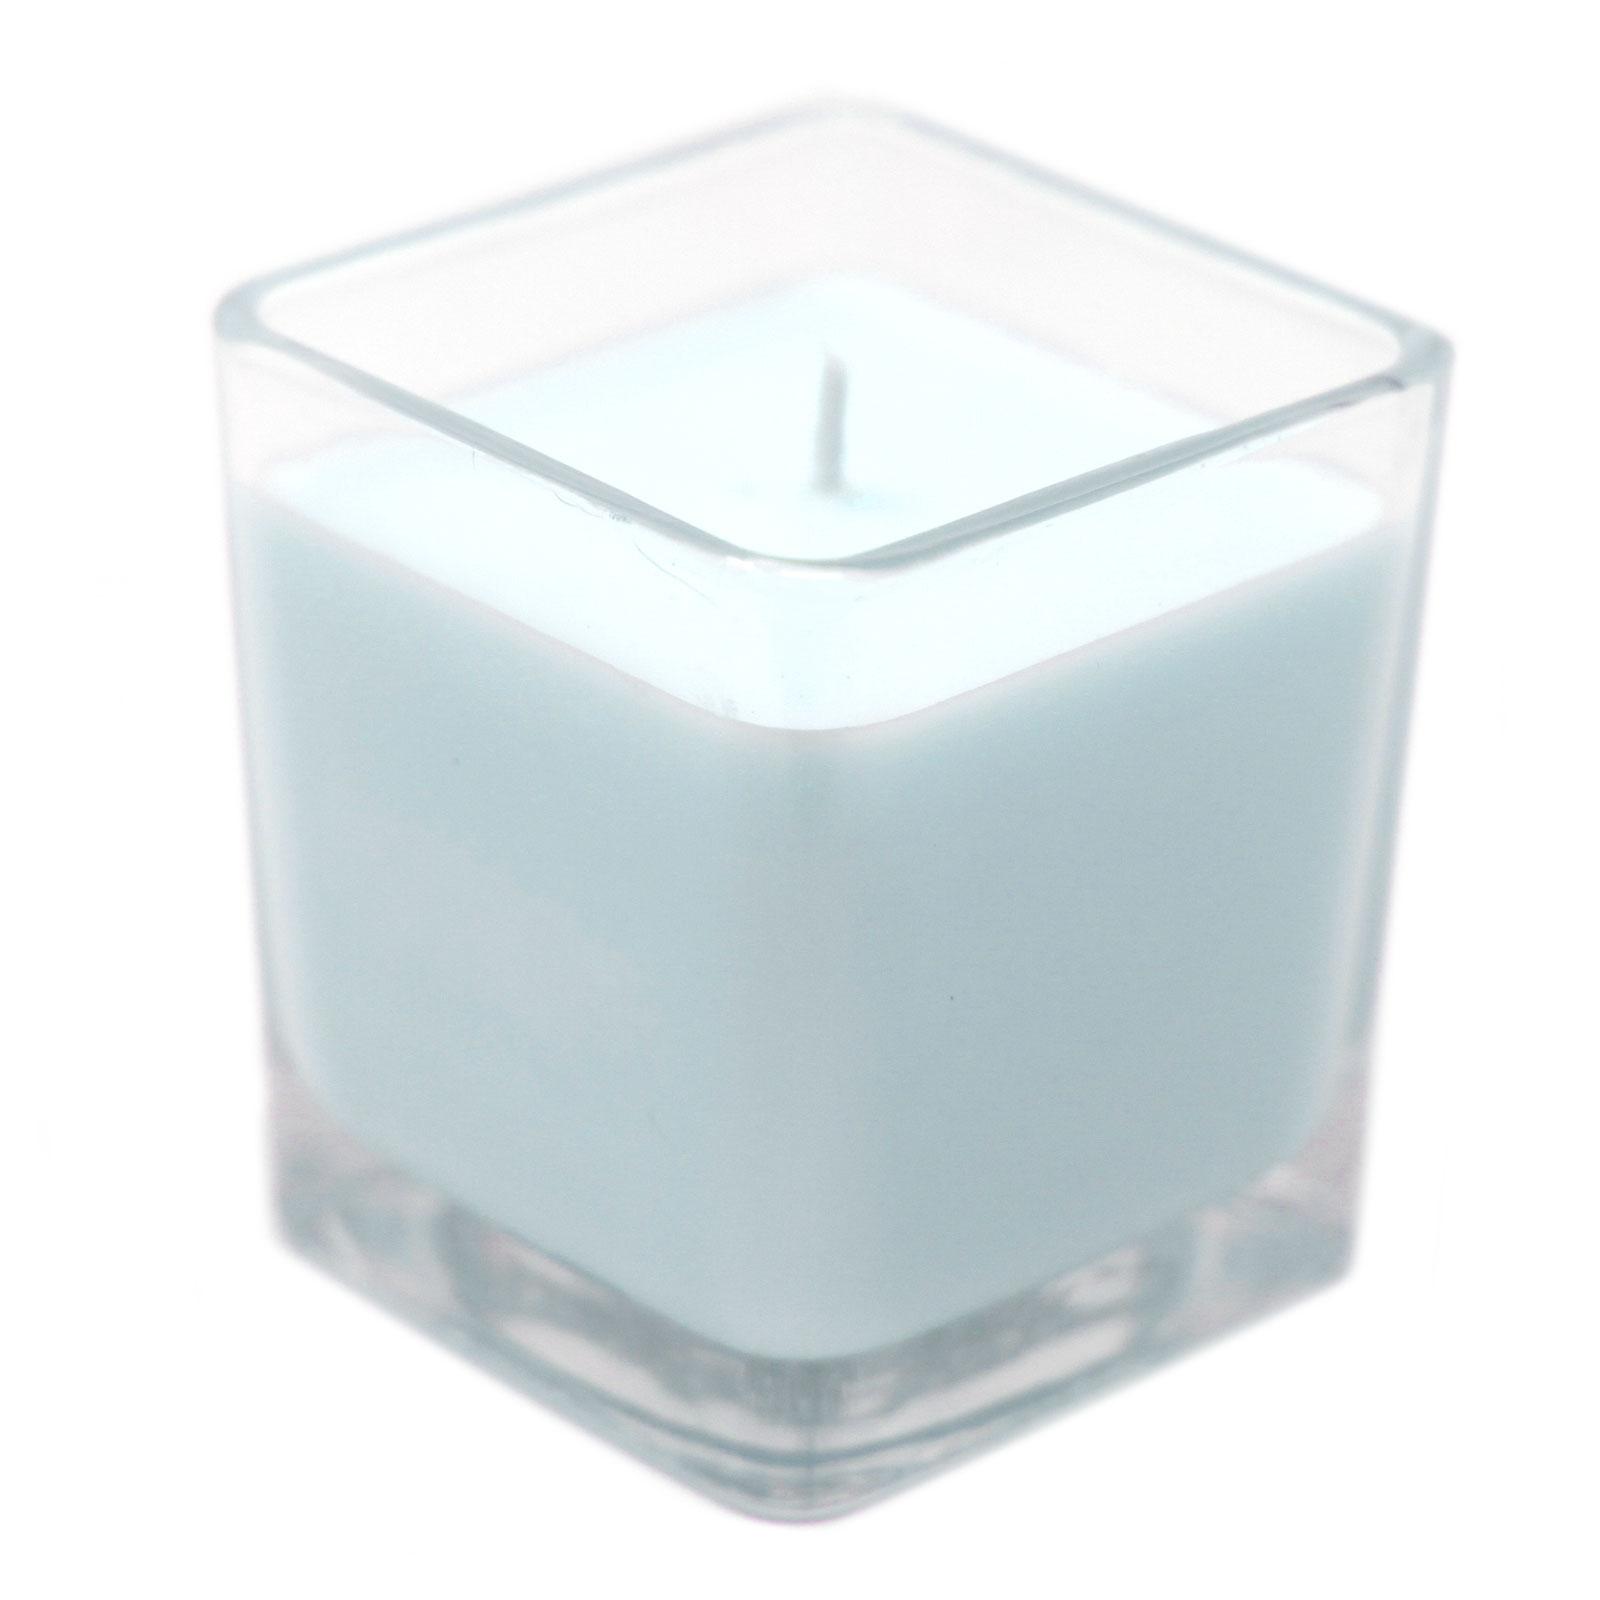 White Label Soy Wax Jar Candle Baby Powder